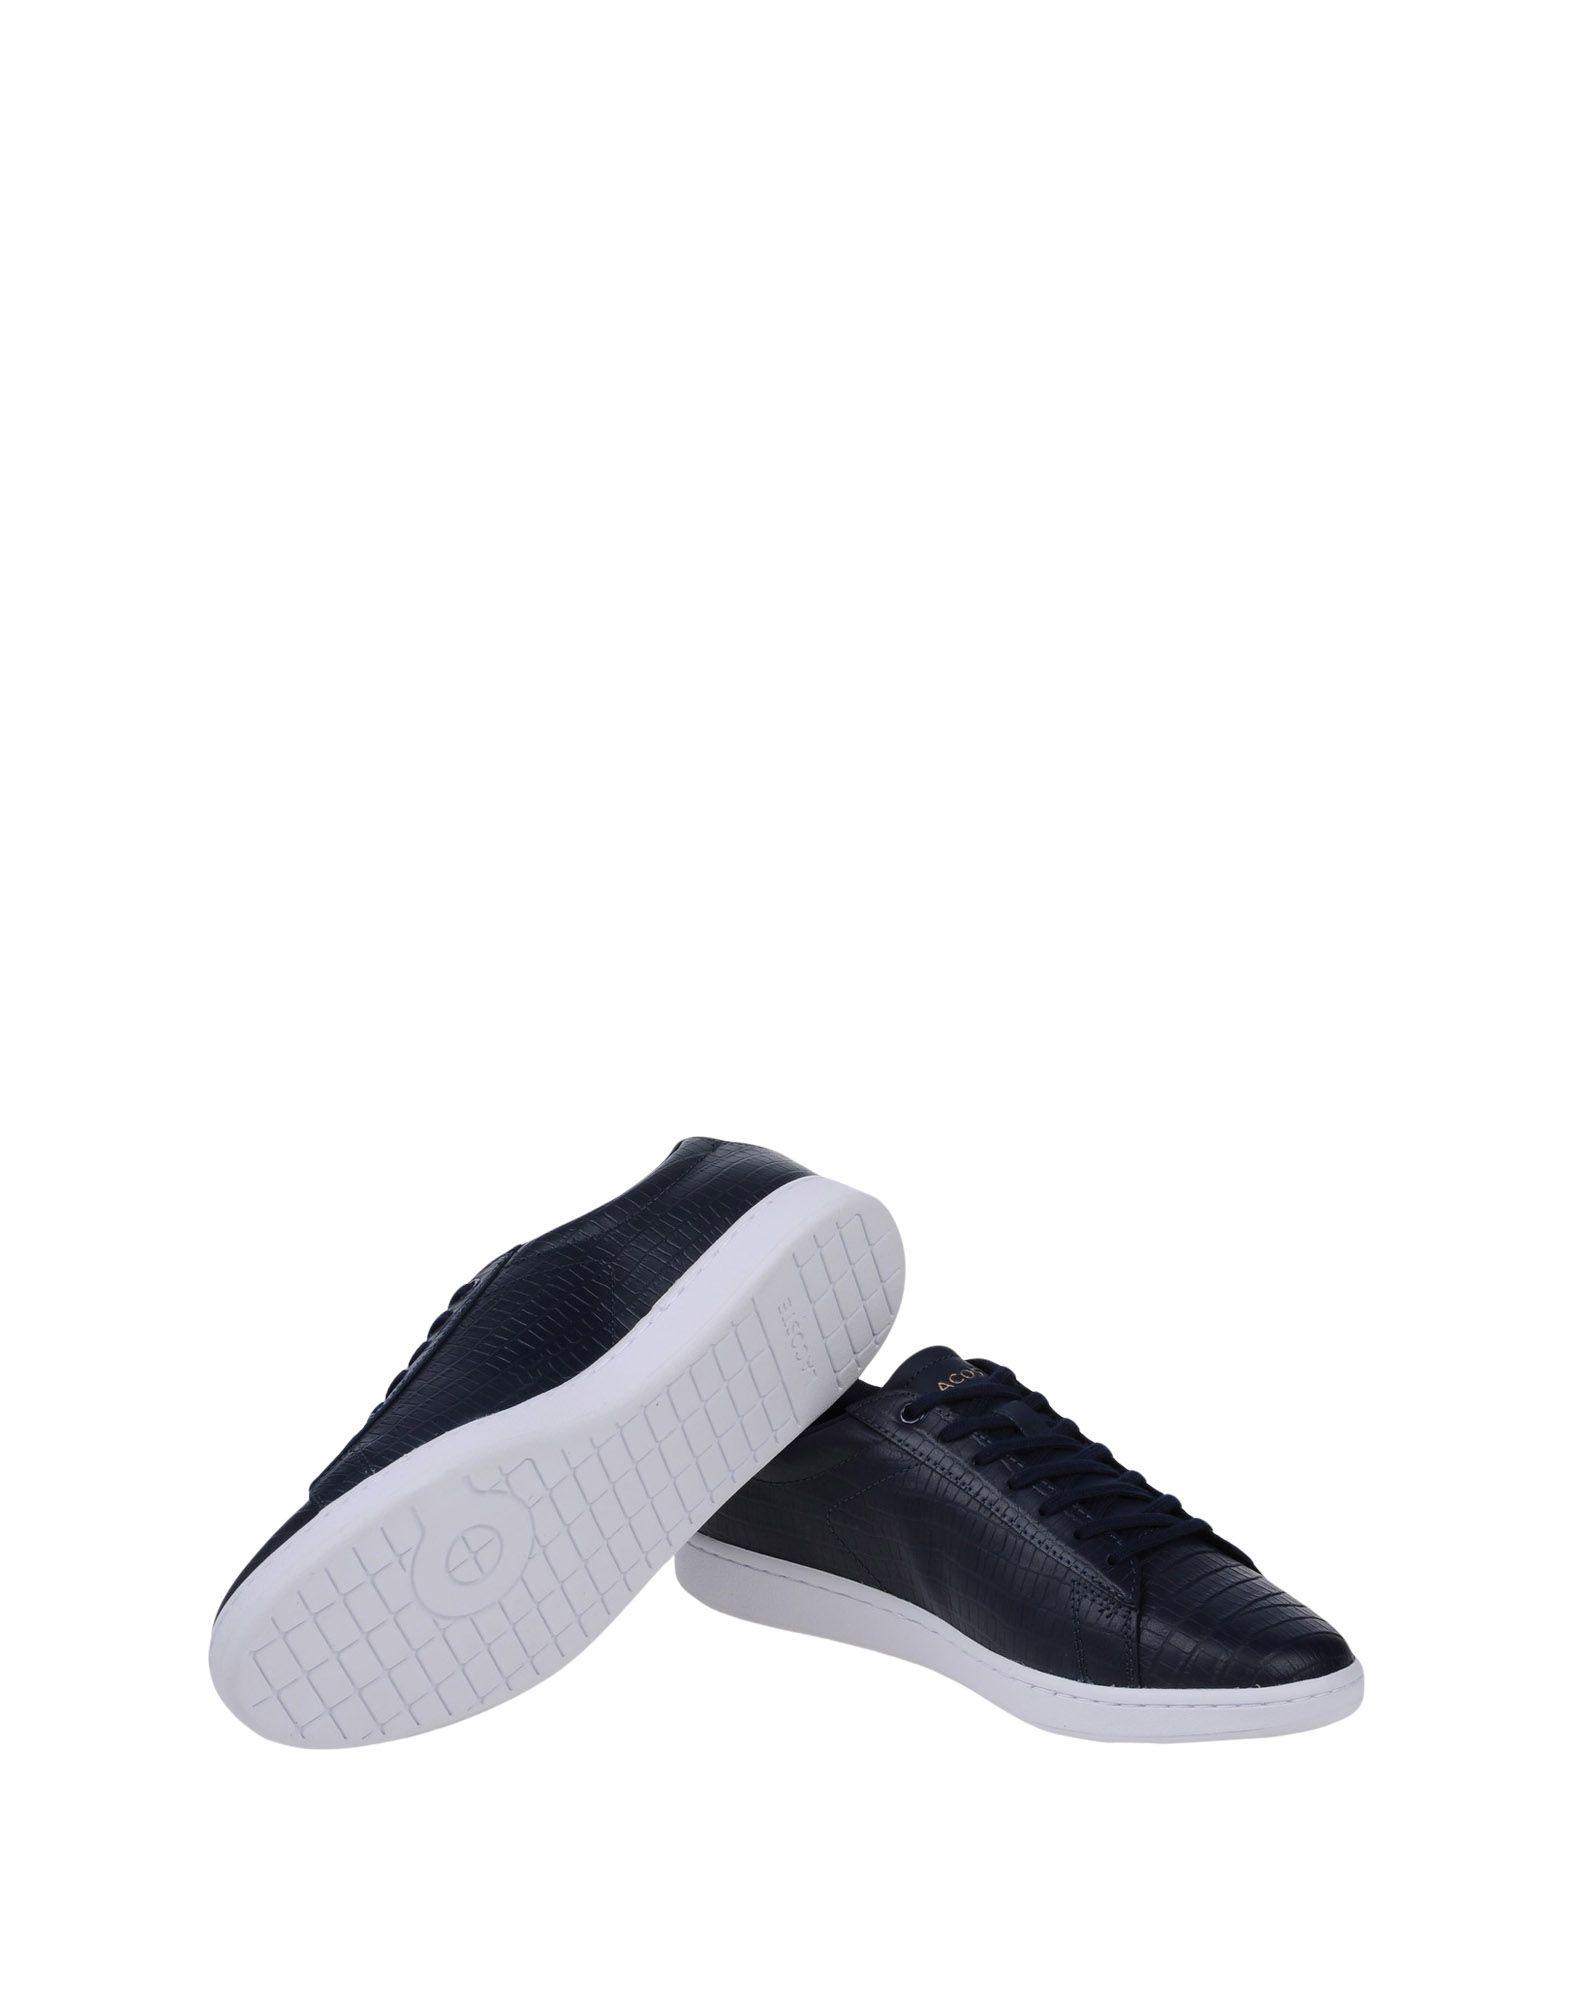 Sneakers Lacoste Carnaby Evo G316 8 - Femme - Sneakers Lacoste sur